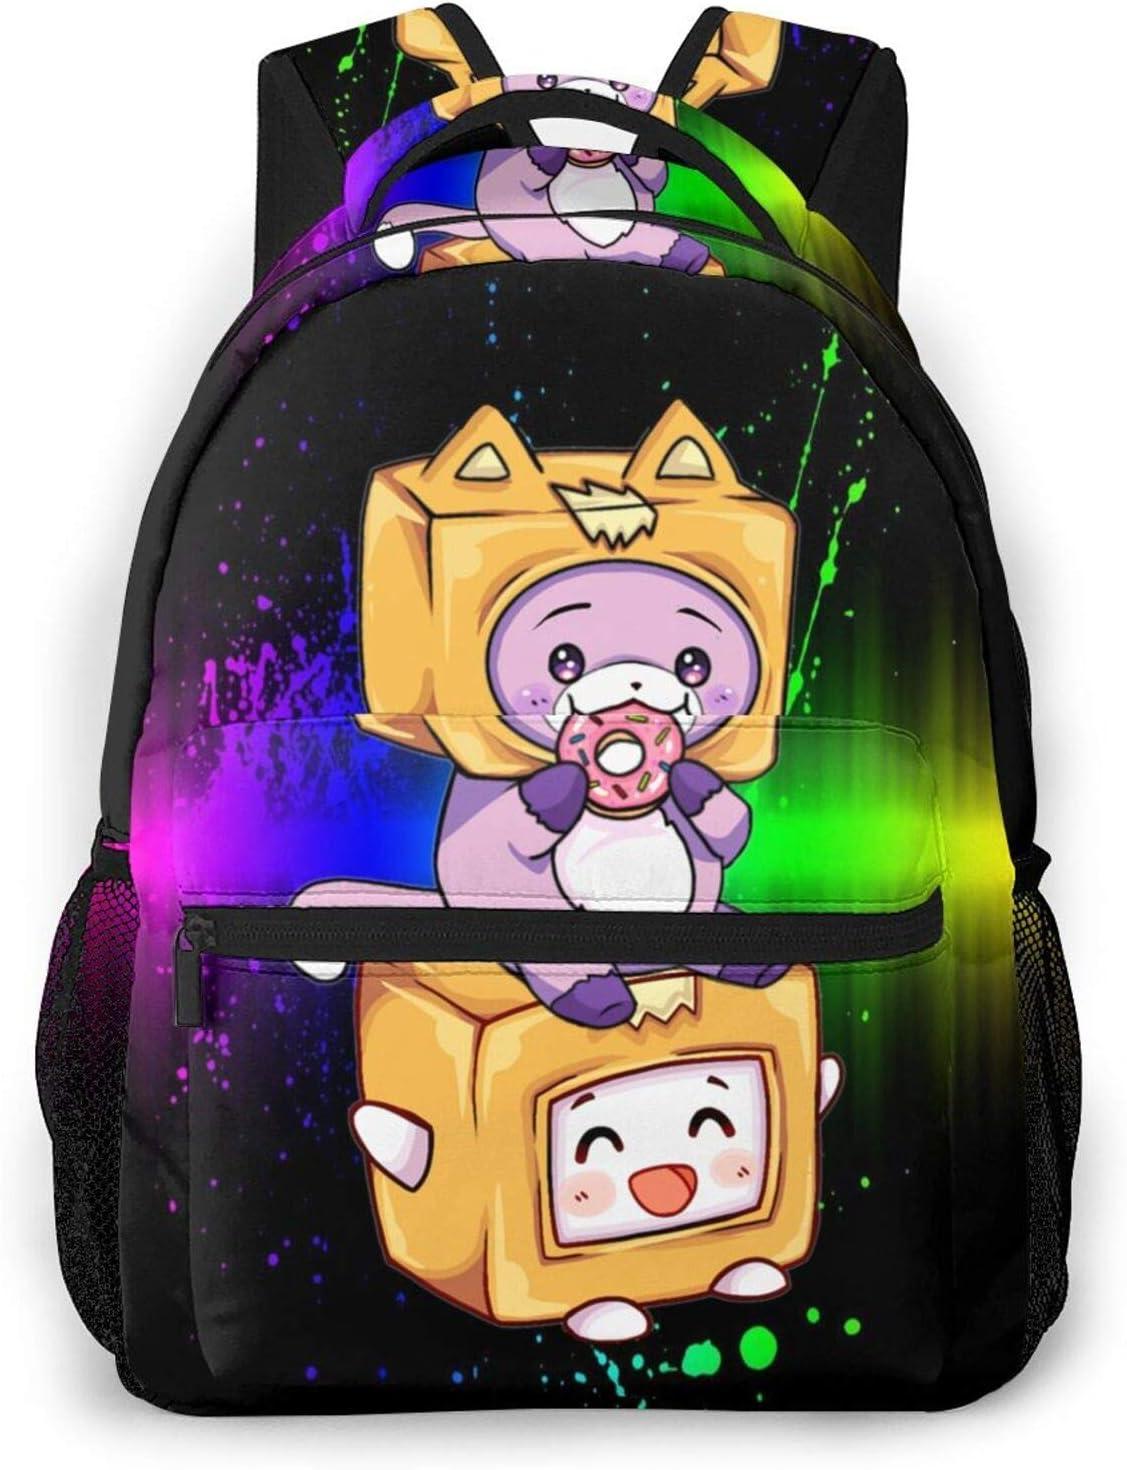 Kid Schoolbag Backpack Child Many popular brands Sale SALE% OFF Student Schoolbags Water Resistant